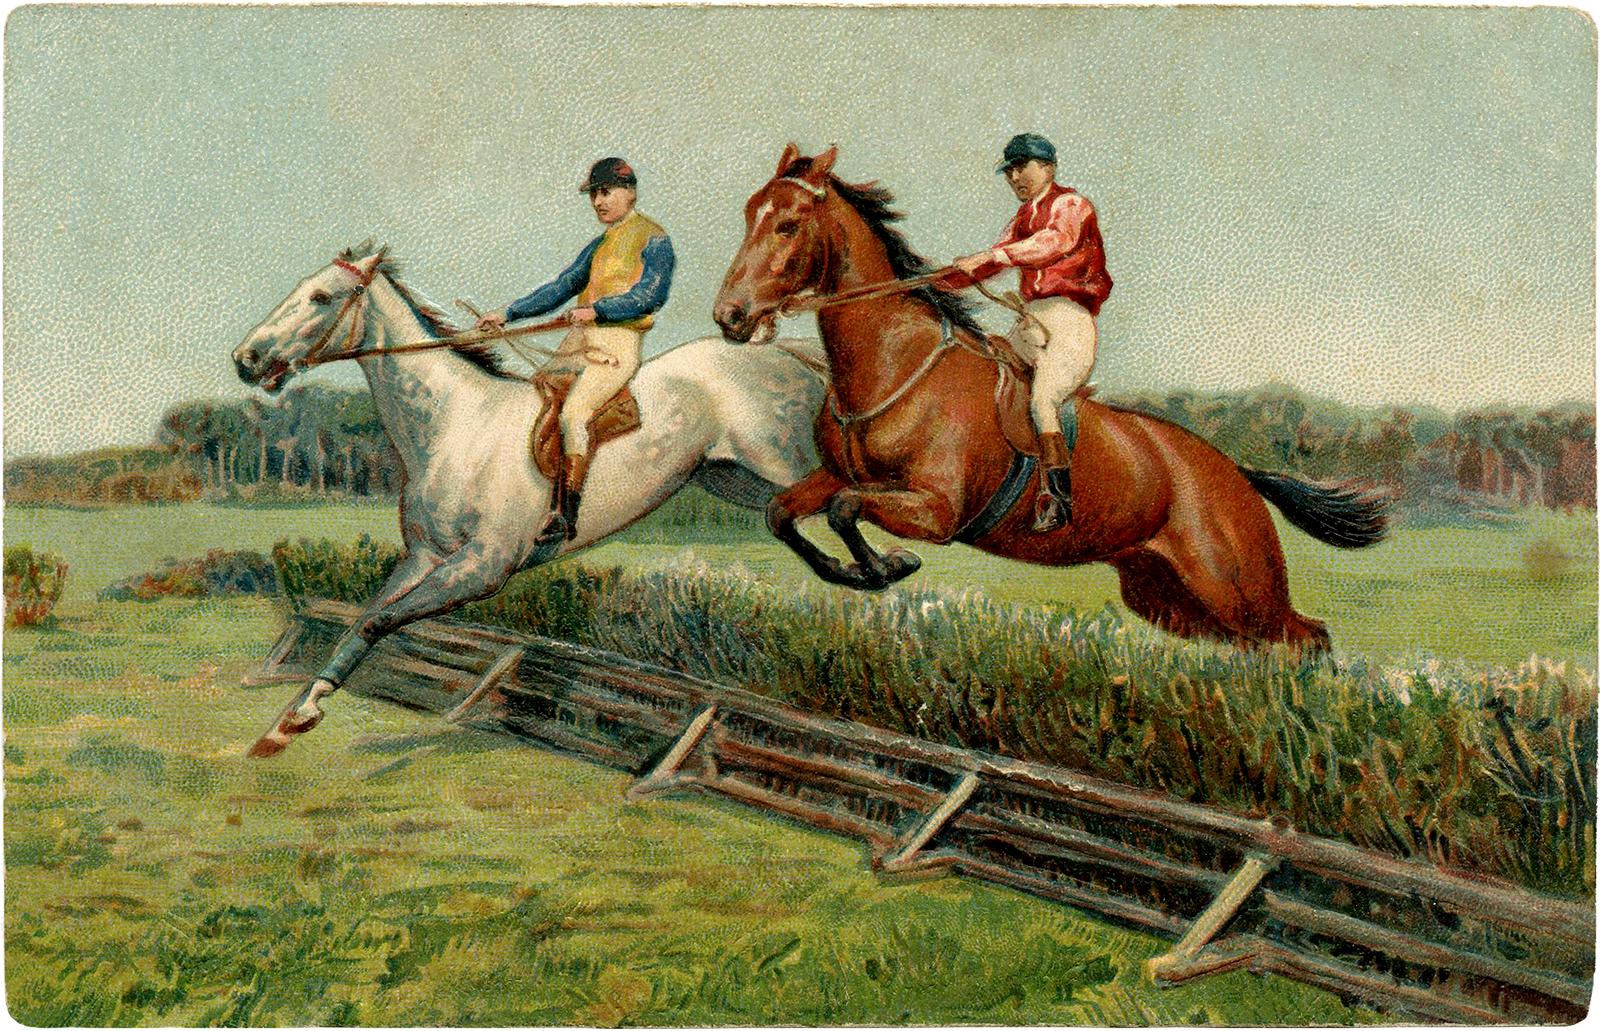 Vintage Horse Racing on Mixed Media Art Halloween